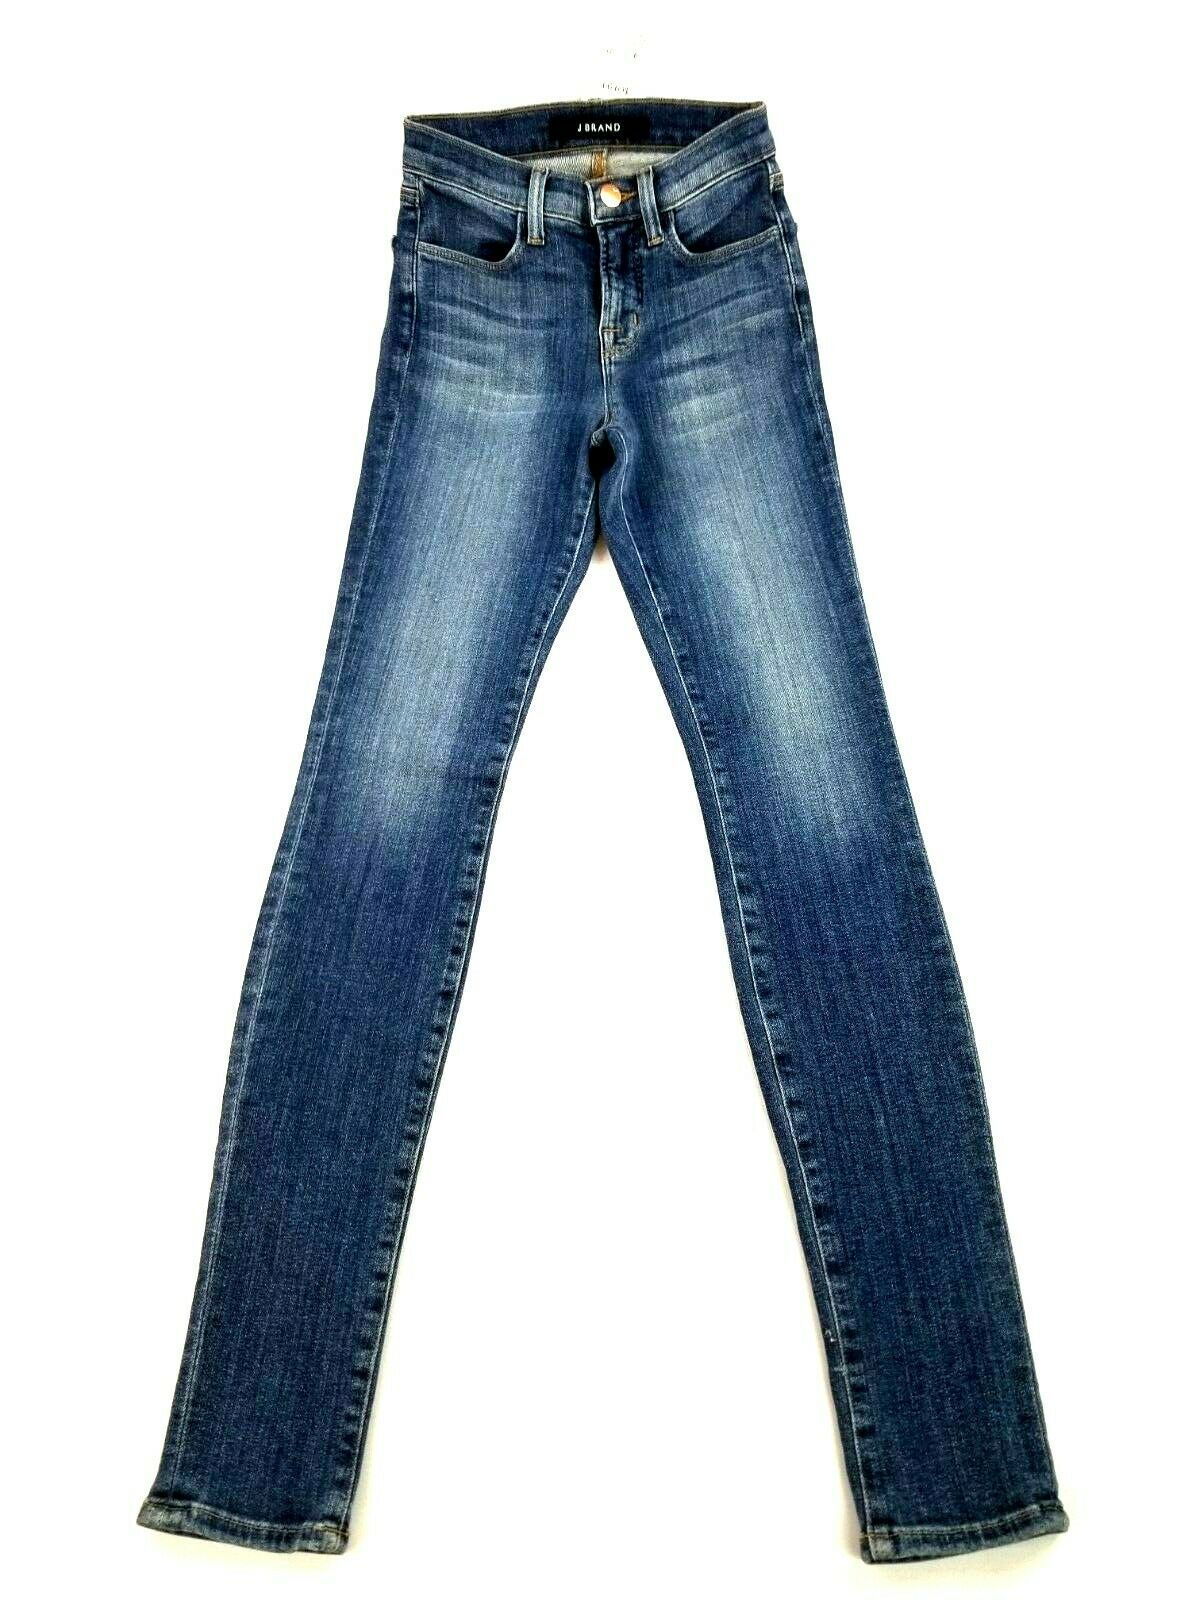 Neuf J Brand Femme Jeans Skinny Maria 23110O212 Divulgation Bleu Sz 22 Pdsf image 3